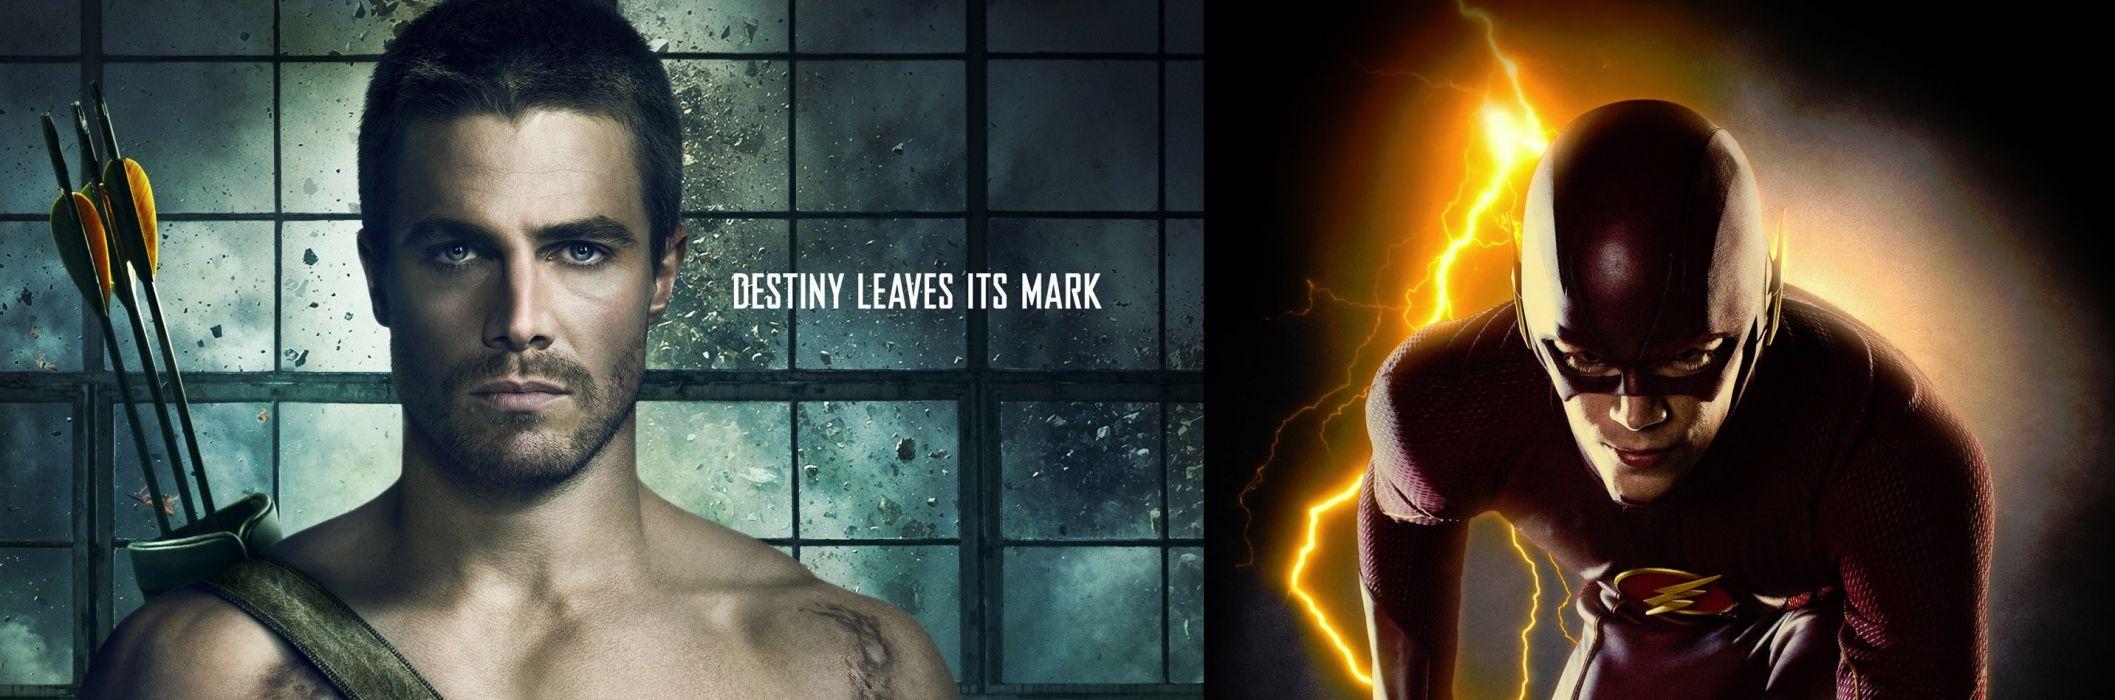 THE FLASH Arrow Superhero Drama Action Series Mystery Sci Fi Dc Comics Comic D C